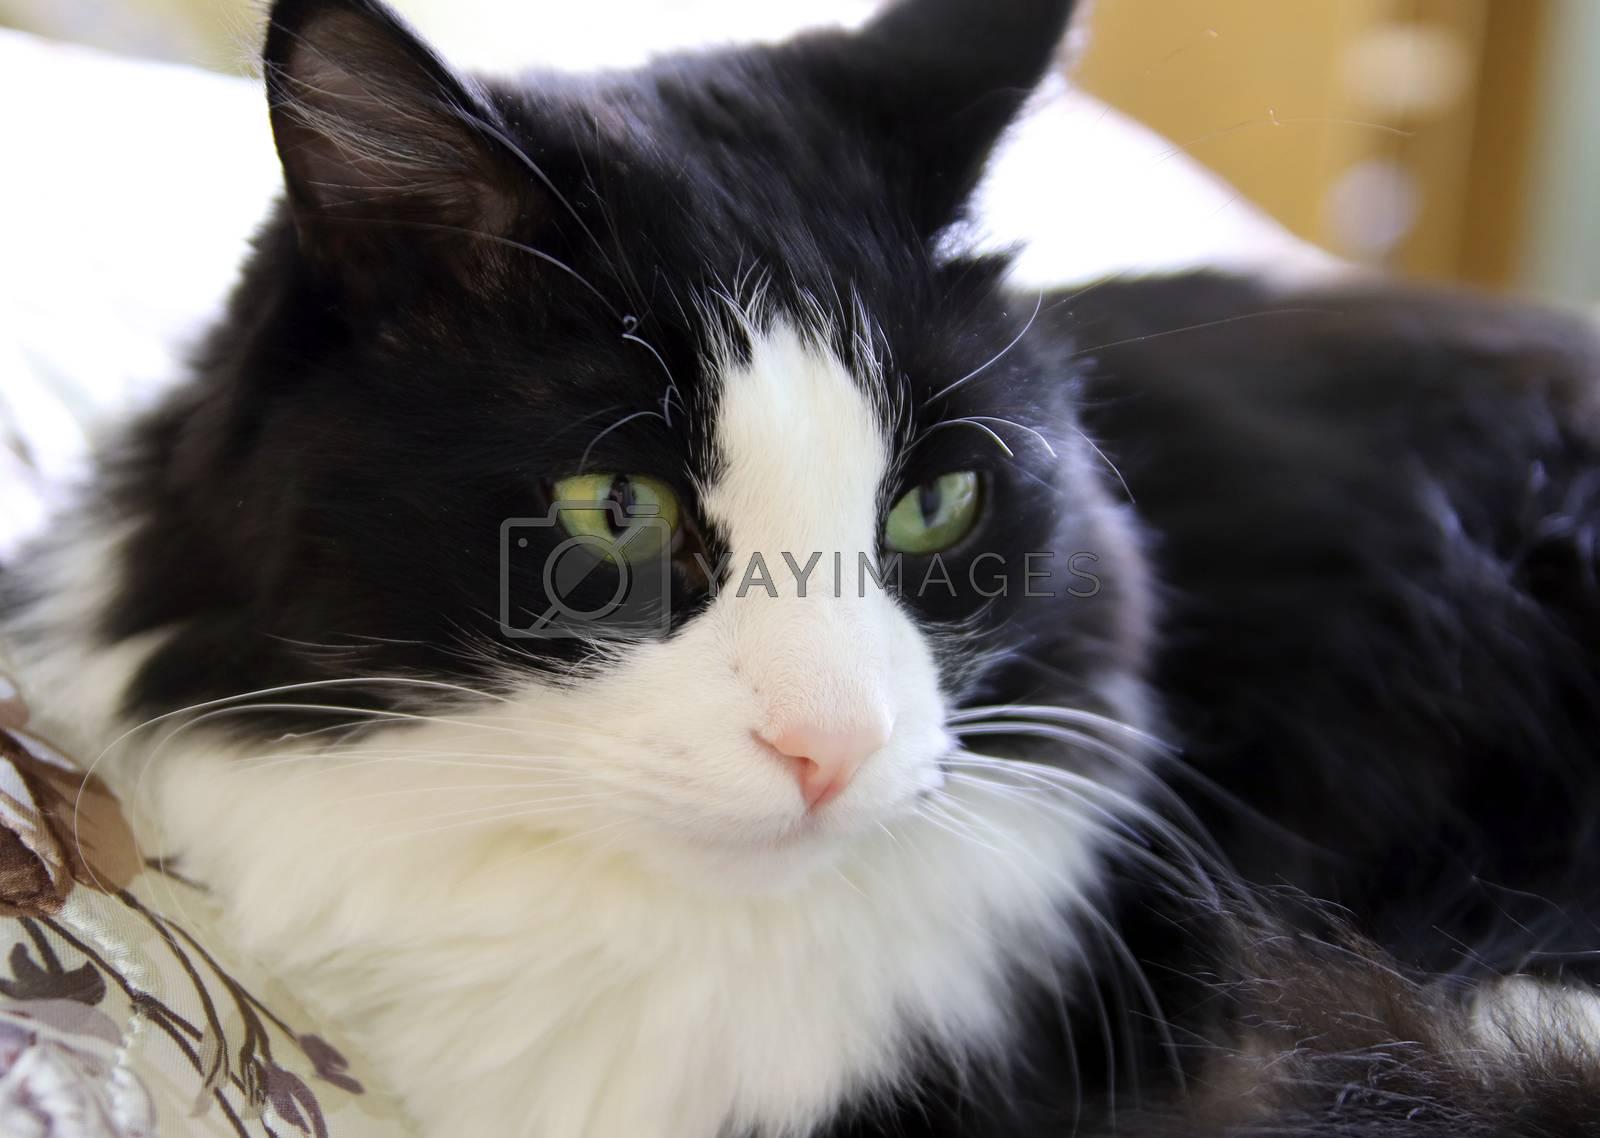 beautiful black and white cat, shallow dof